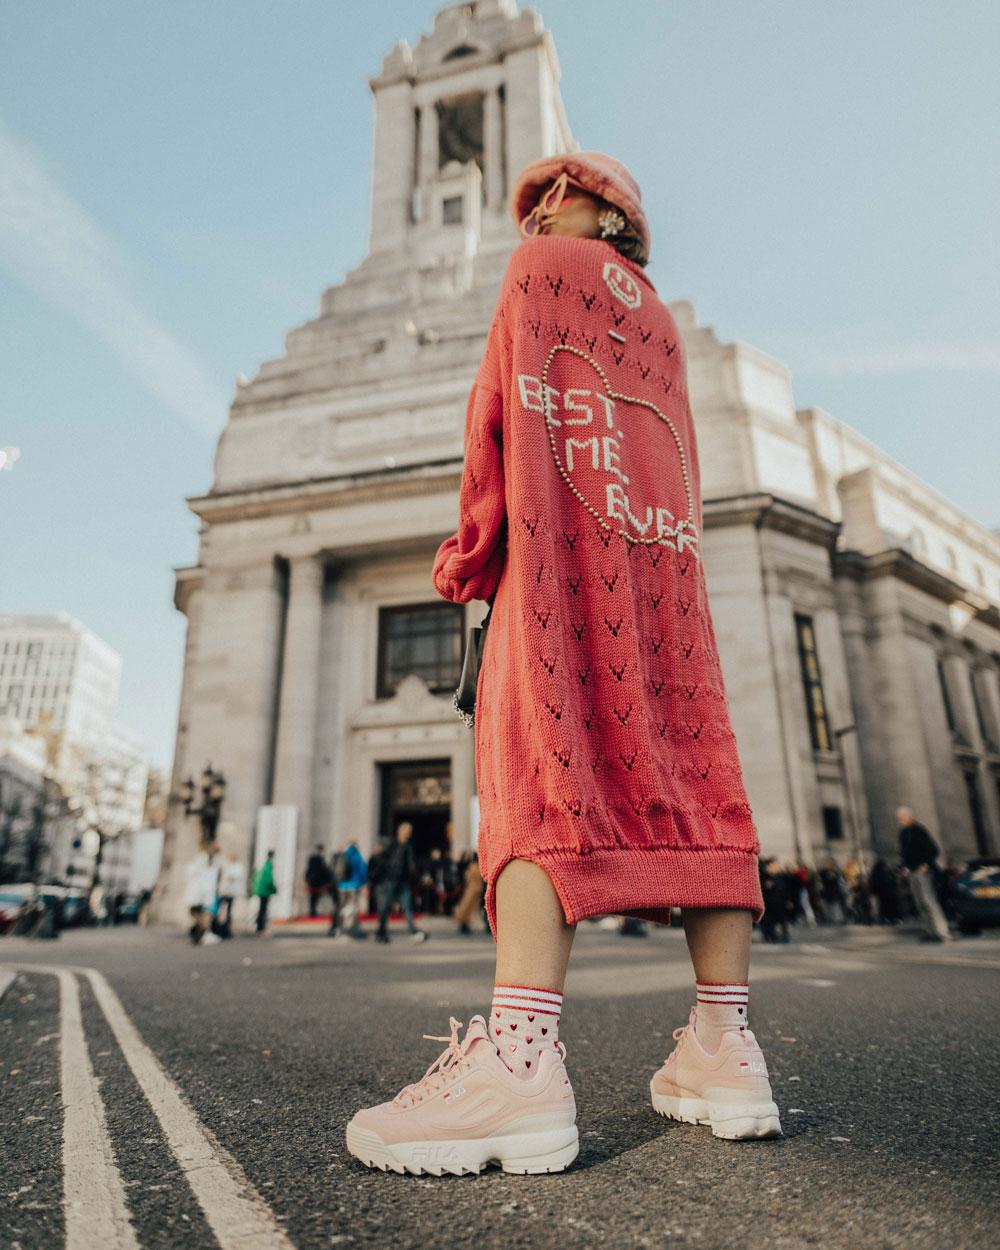 london-fashion-week-aw19-103-1.jpg